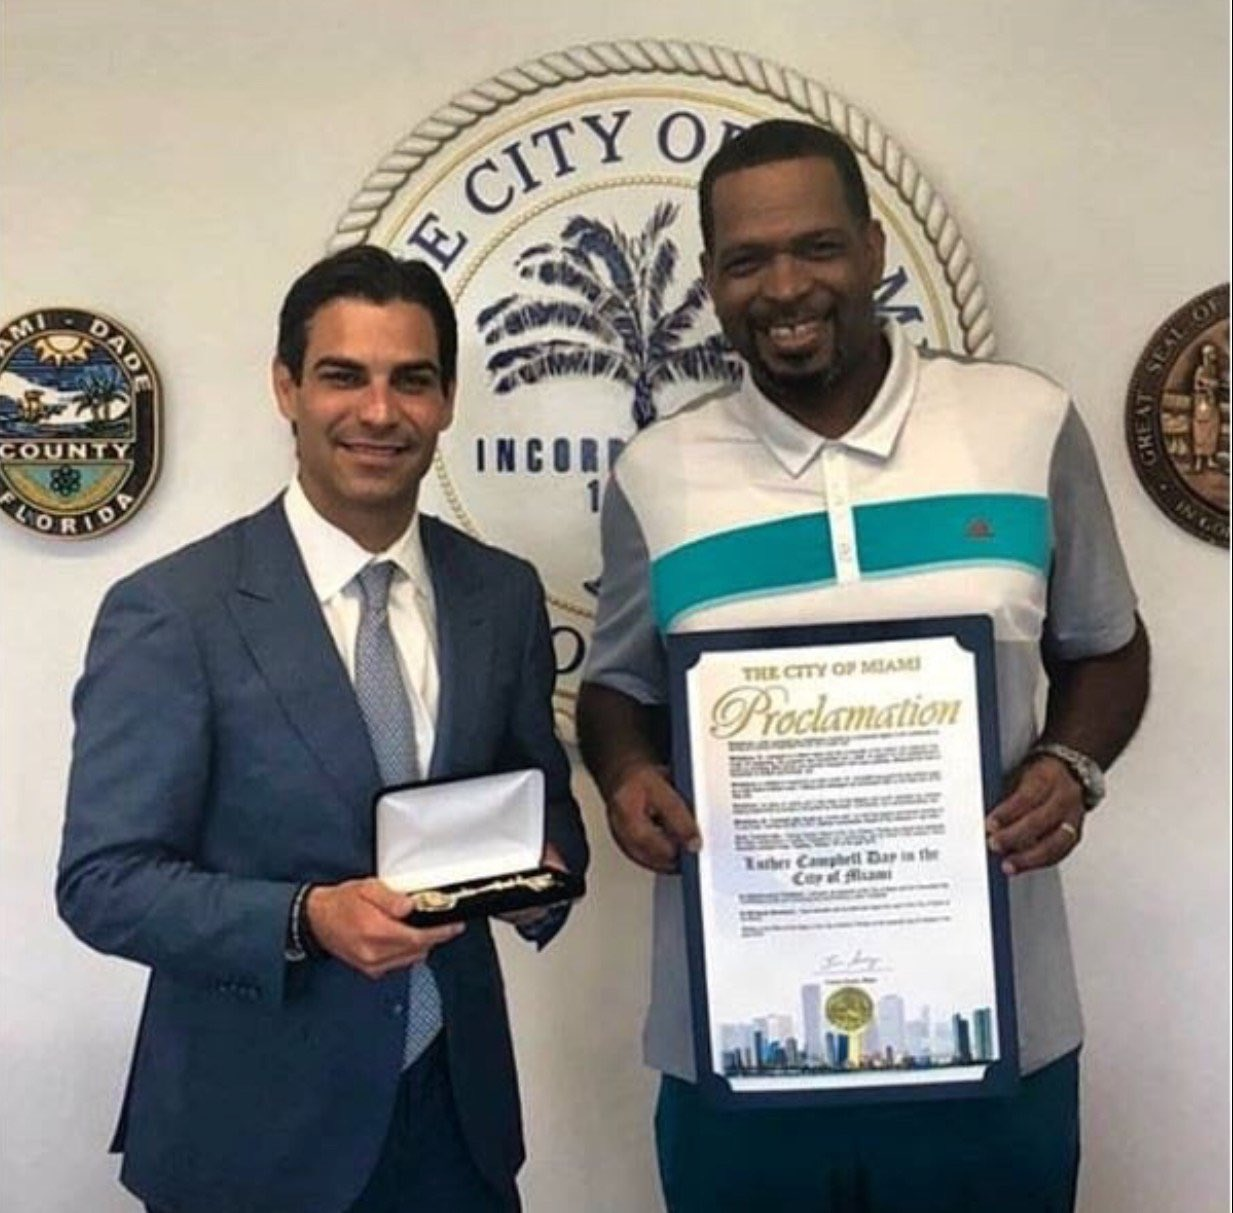 Mayor Francis Suarez Awards Uncle Luke A Key to Miami: https://t.co/eJDwQE0DgO https://t.co/kf8OxwyJcT